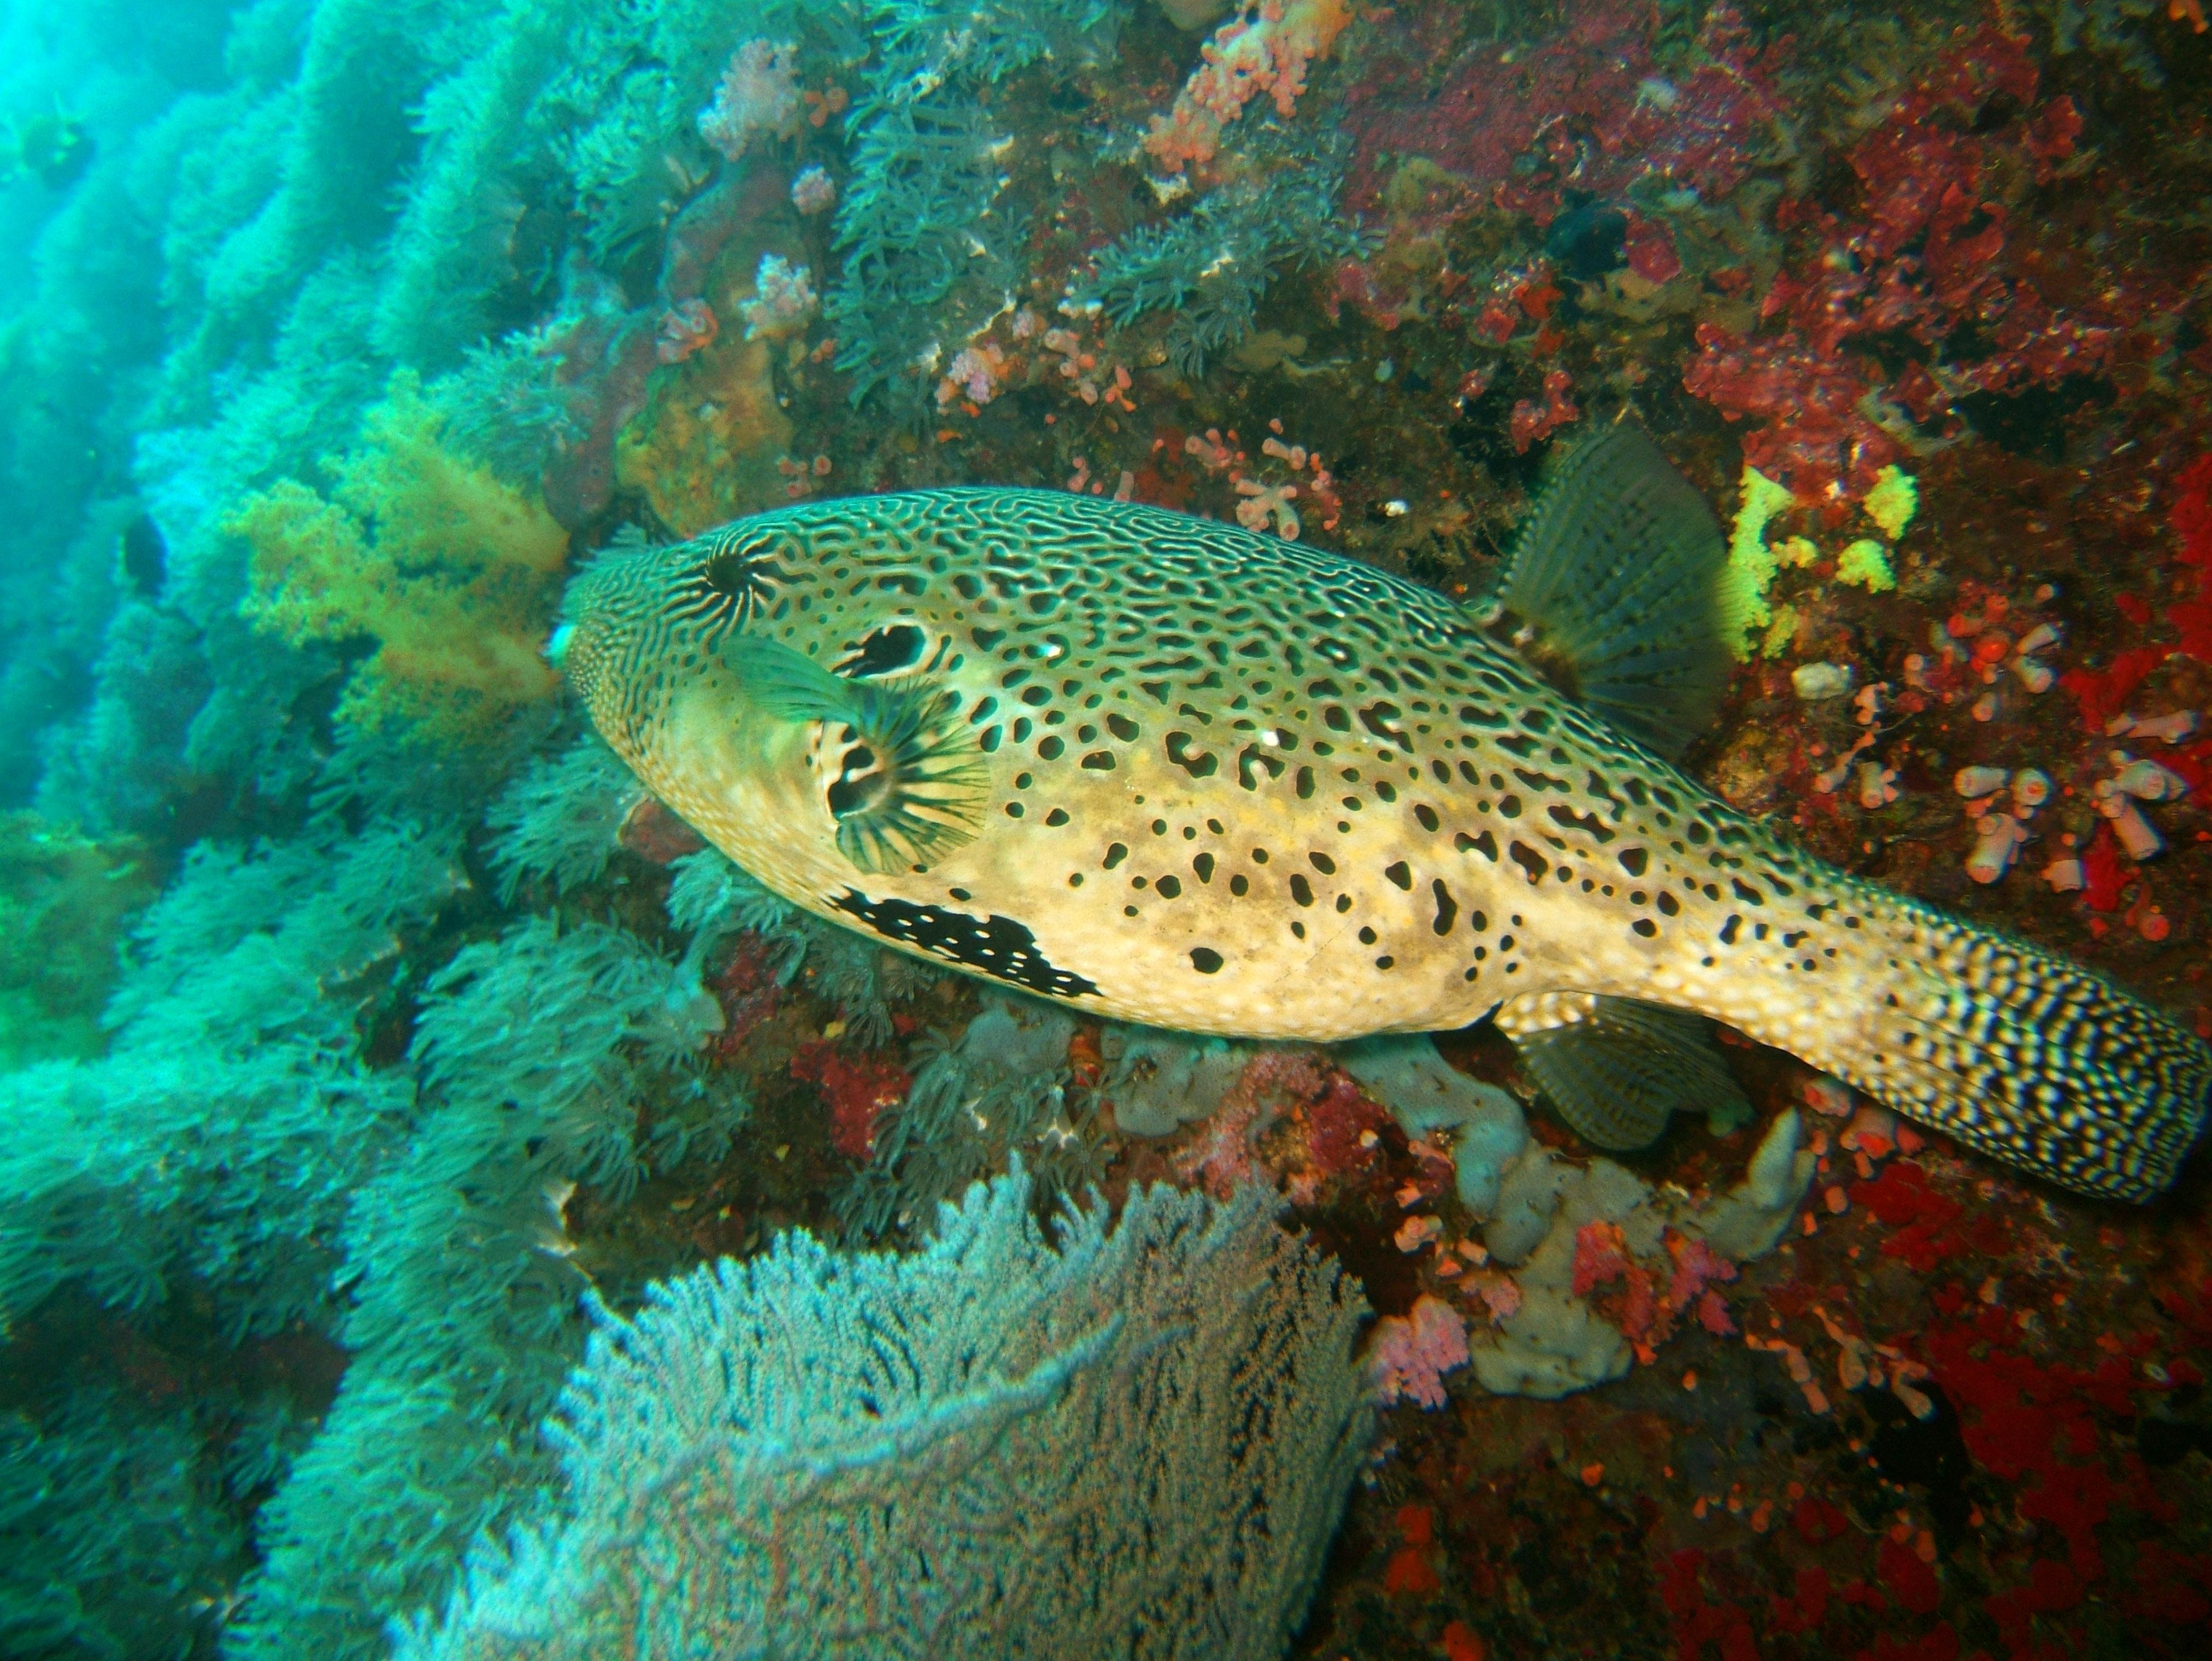 Philippines Cebu Moal Boal 20051228 Dive 1 Pescador Island 11